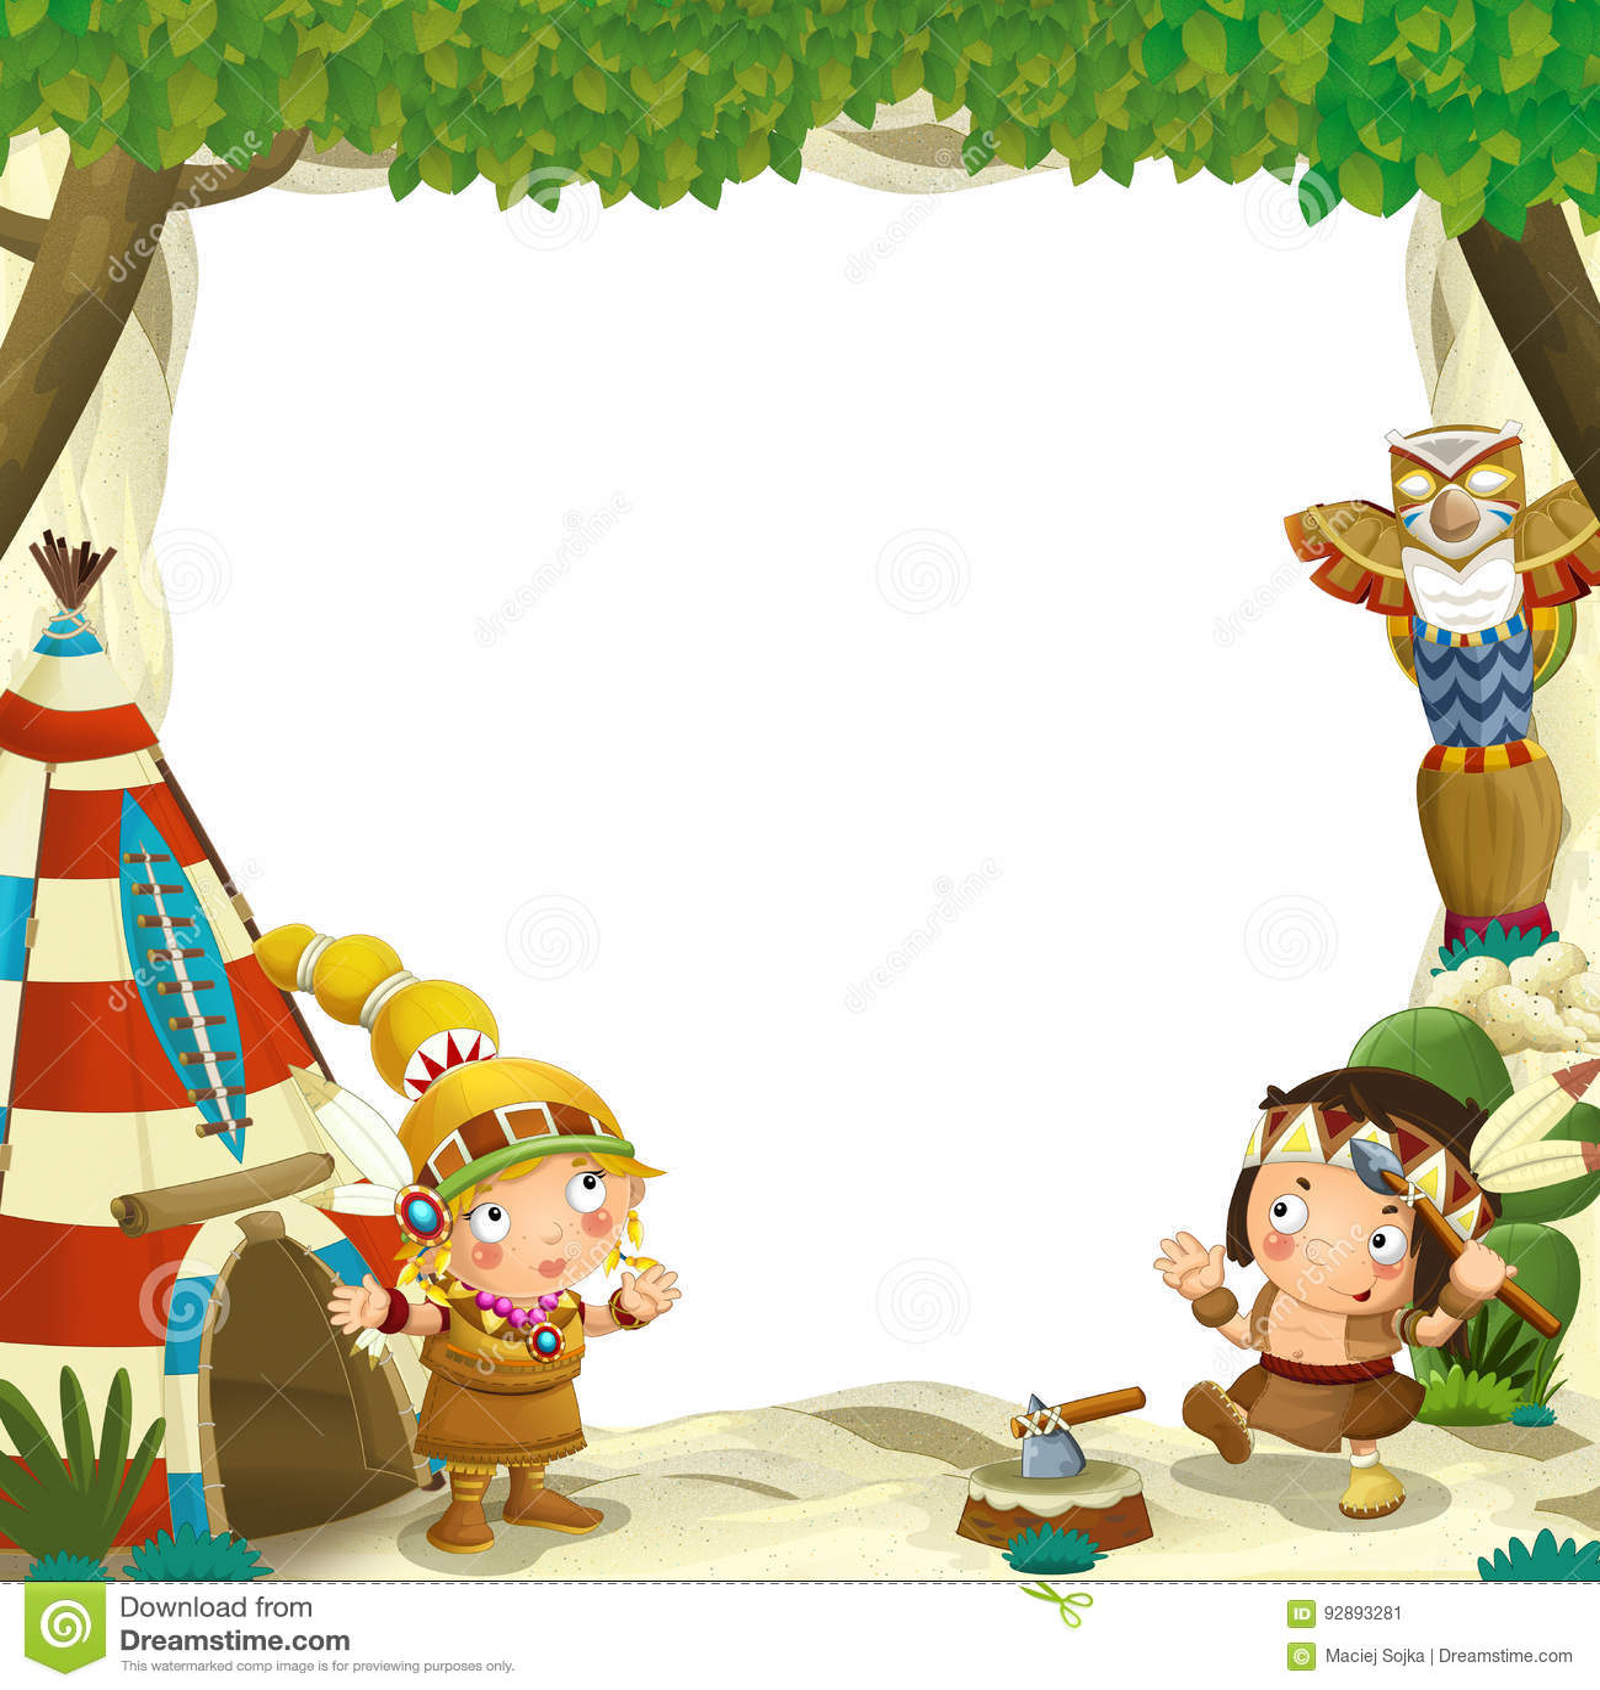 Cartoon Character Border Design : Cartoon characters border frame vector illustration